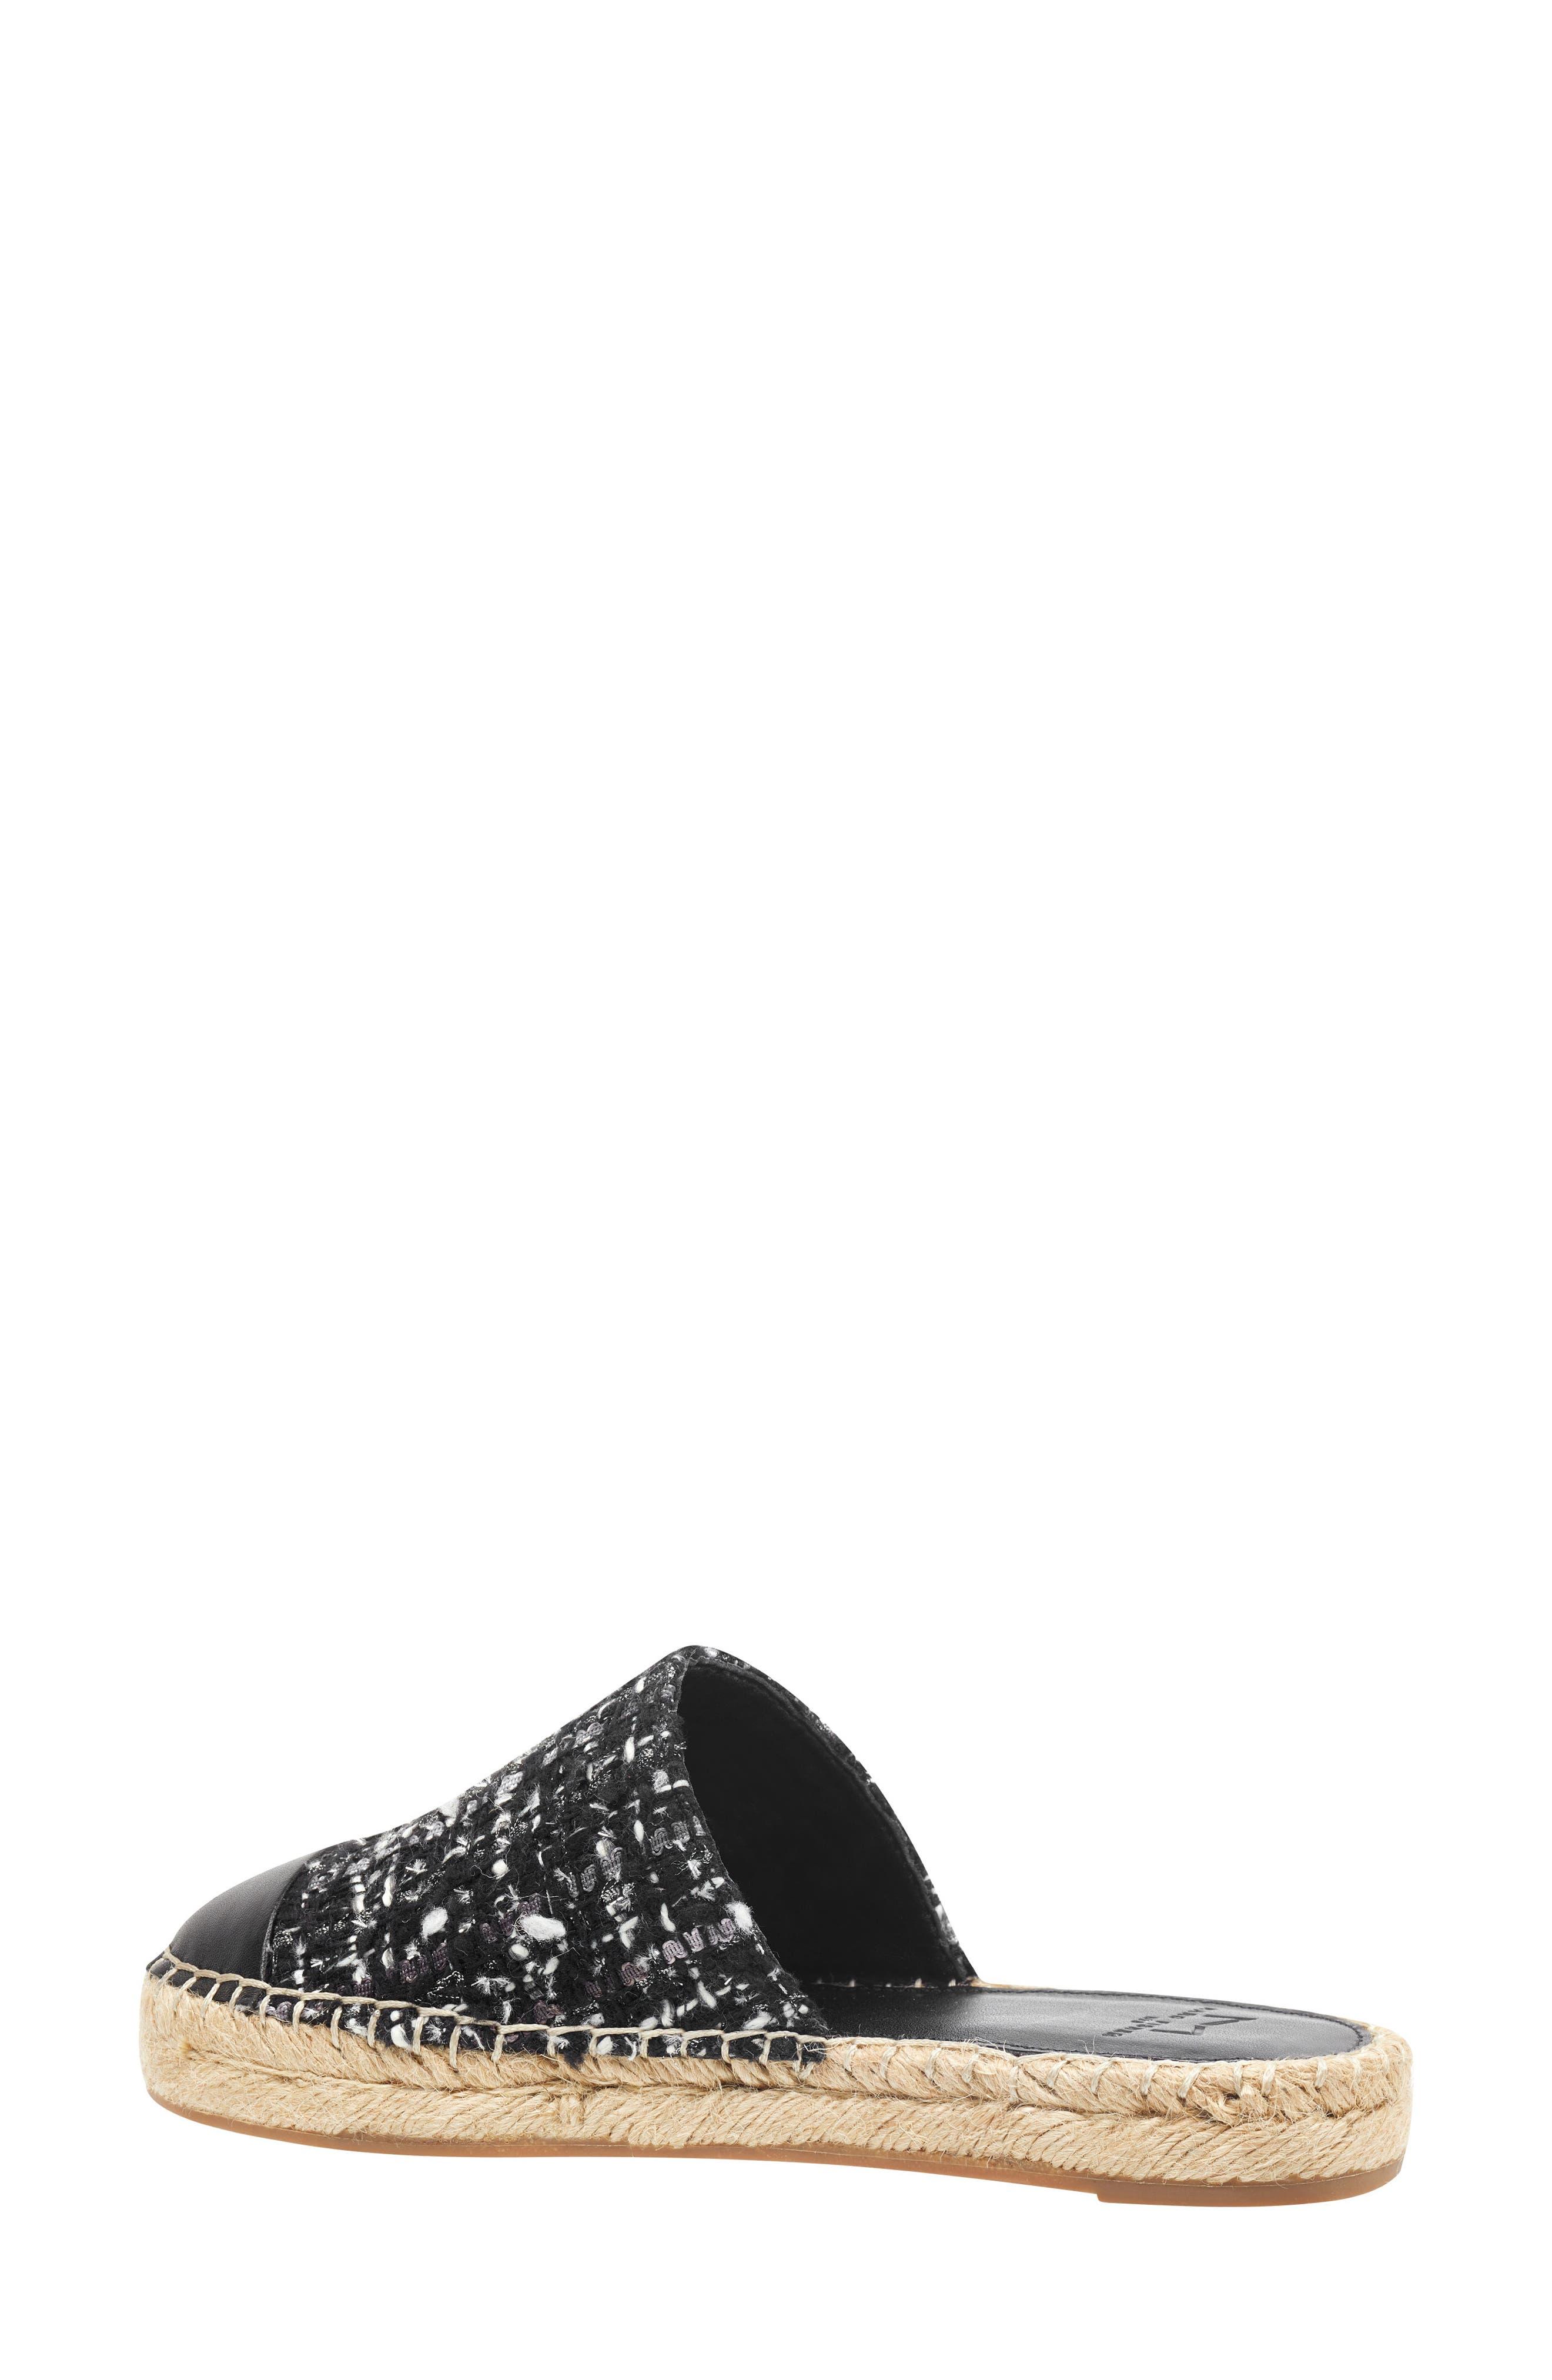 Emilie Cap Toe Mule,                             Alternate thumbnail 2, color,                             BLACK MULTI PRINT